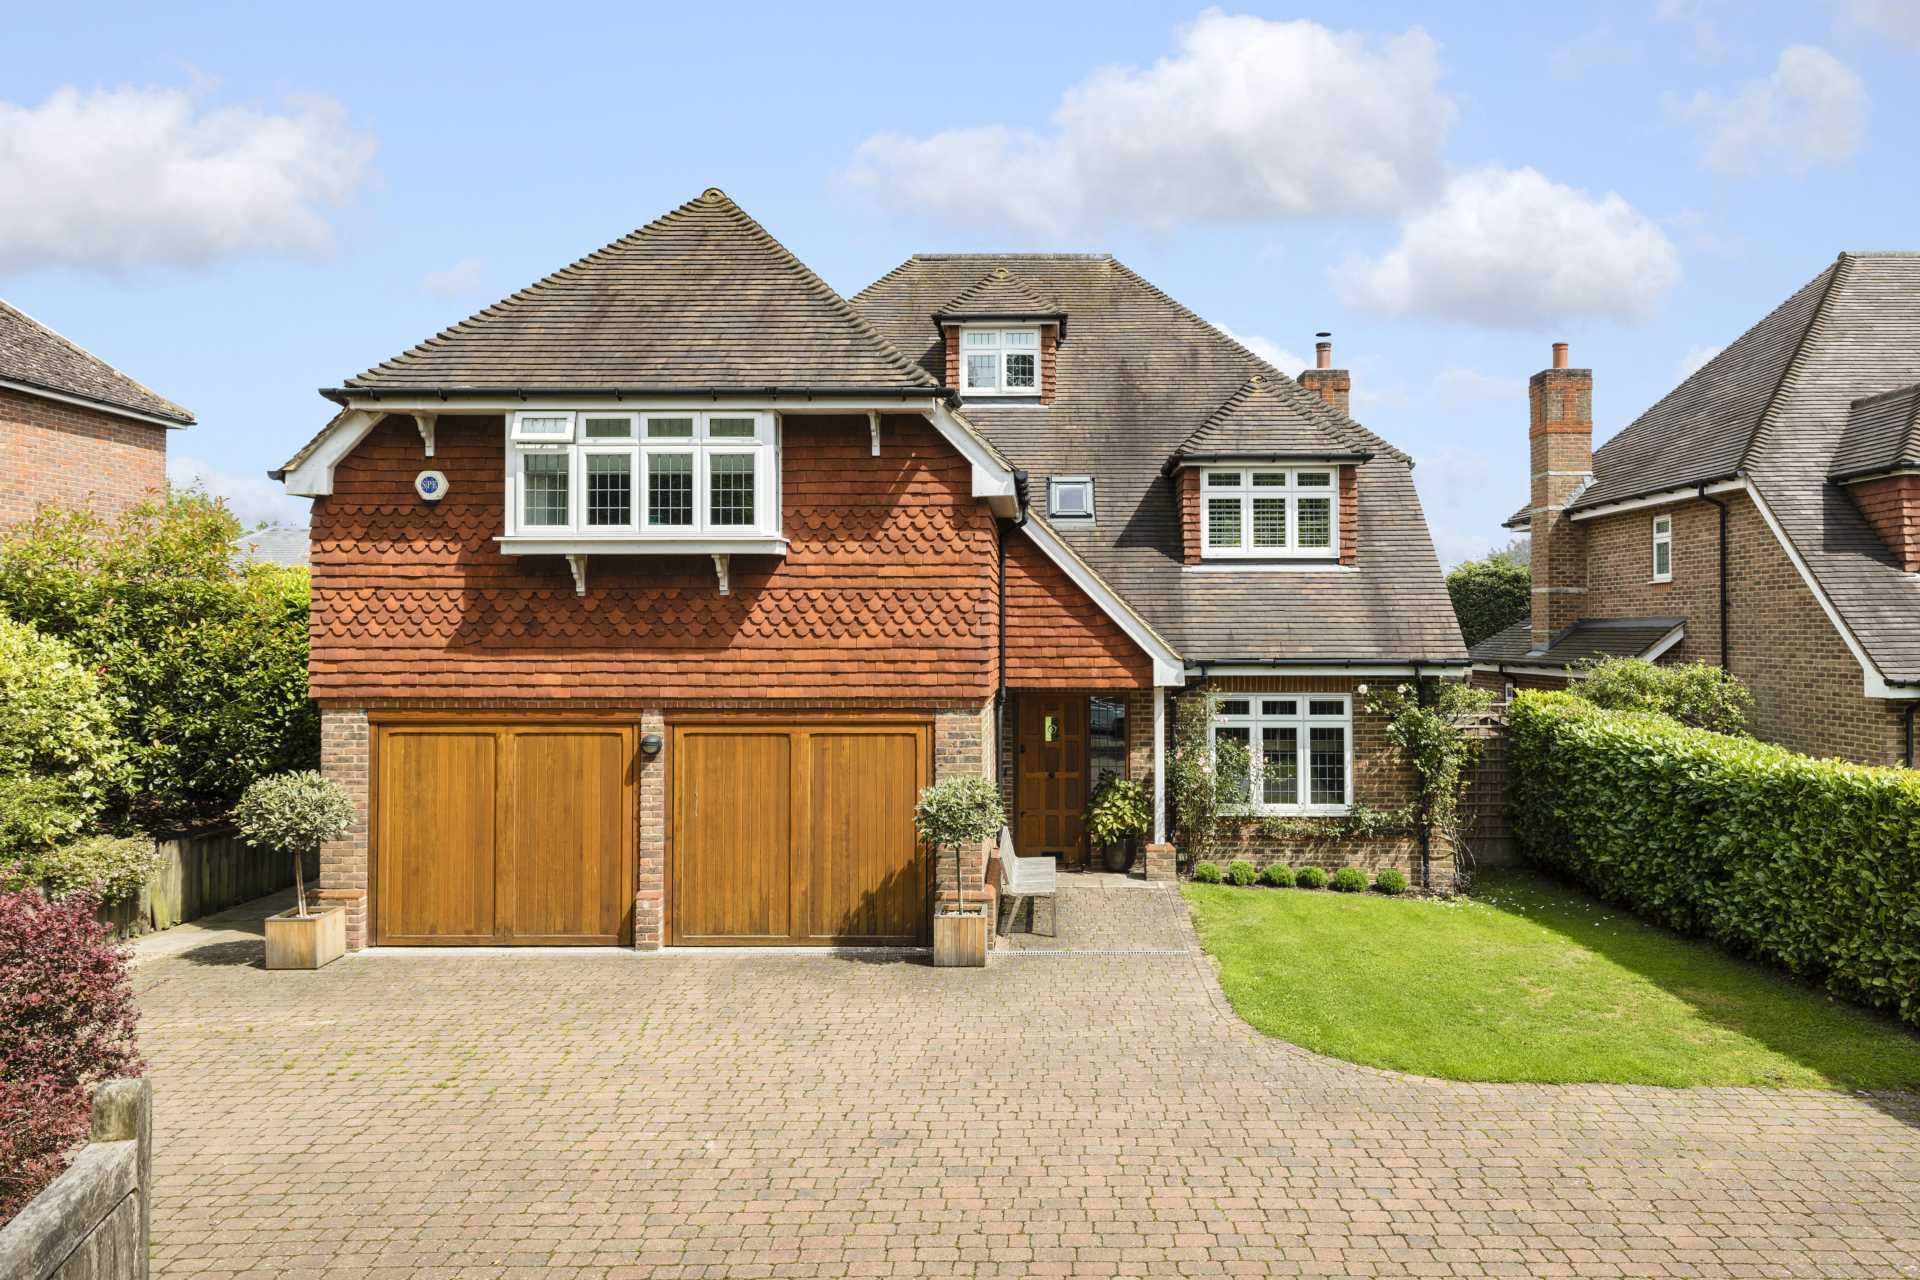 London Road, Southborough, Image 23